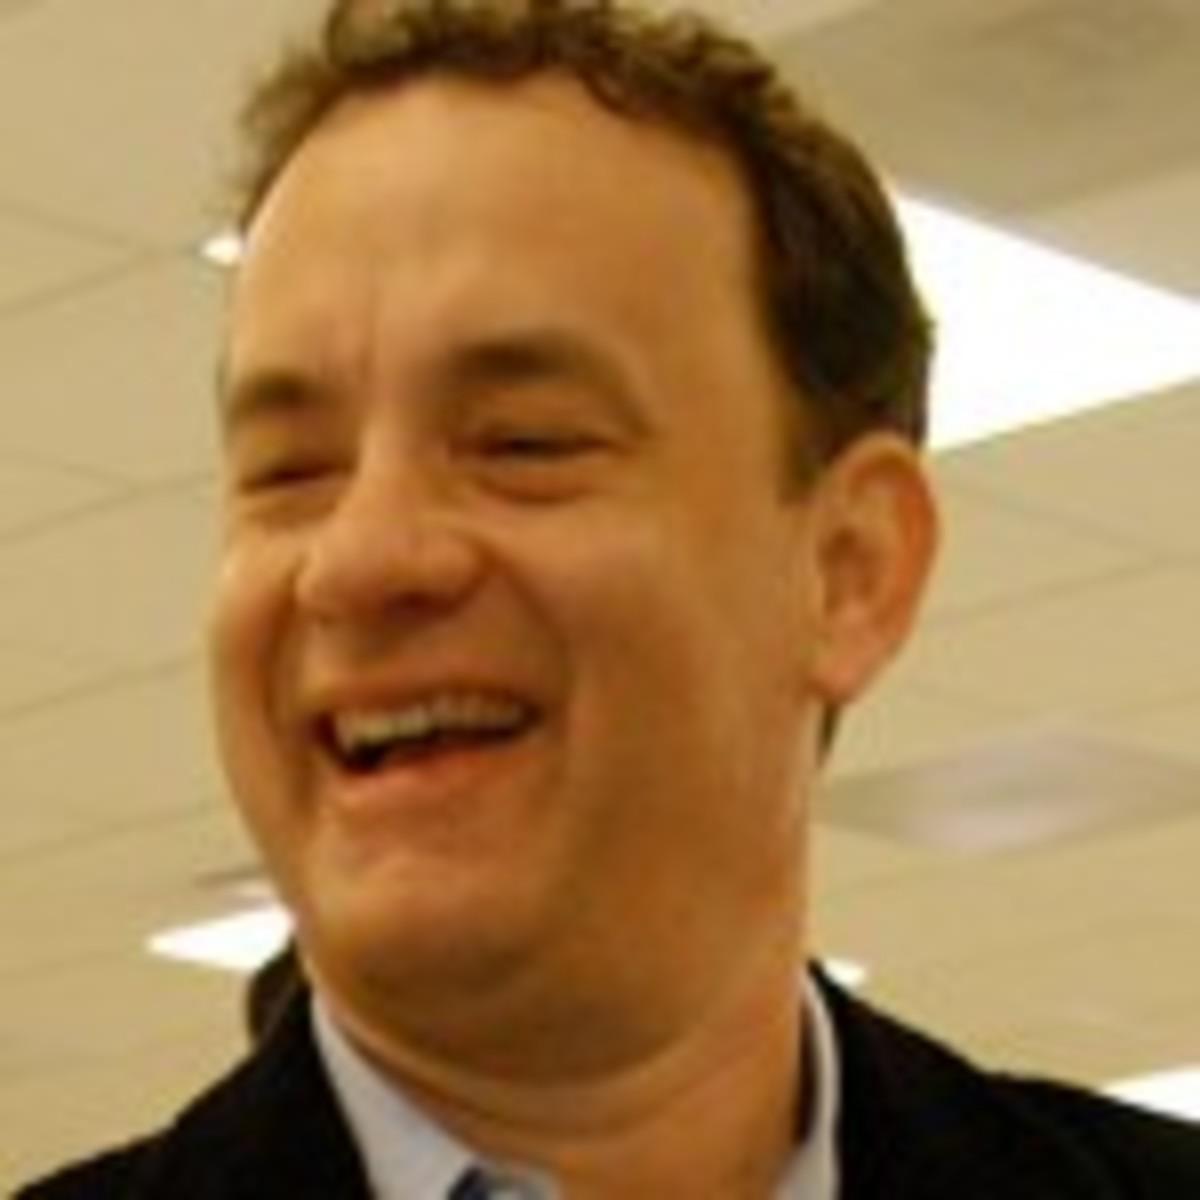 Tom_Hanks,_smiling1a